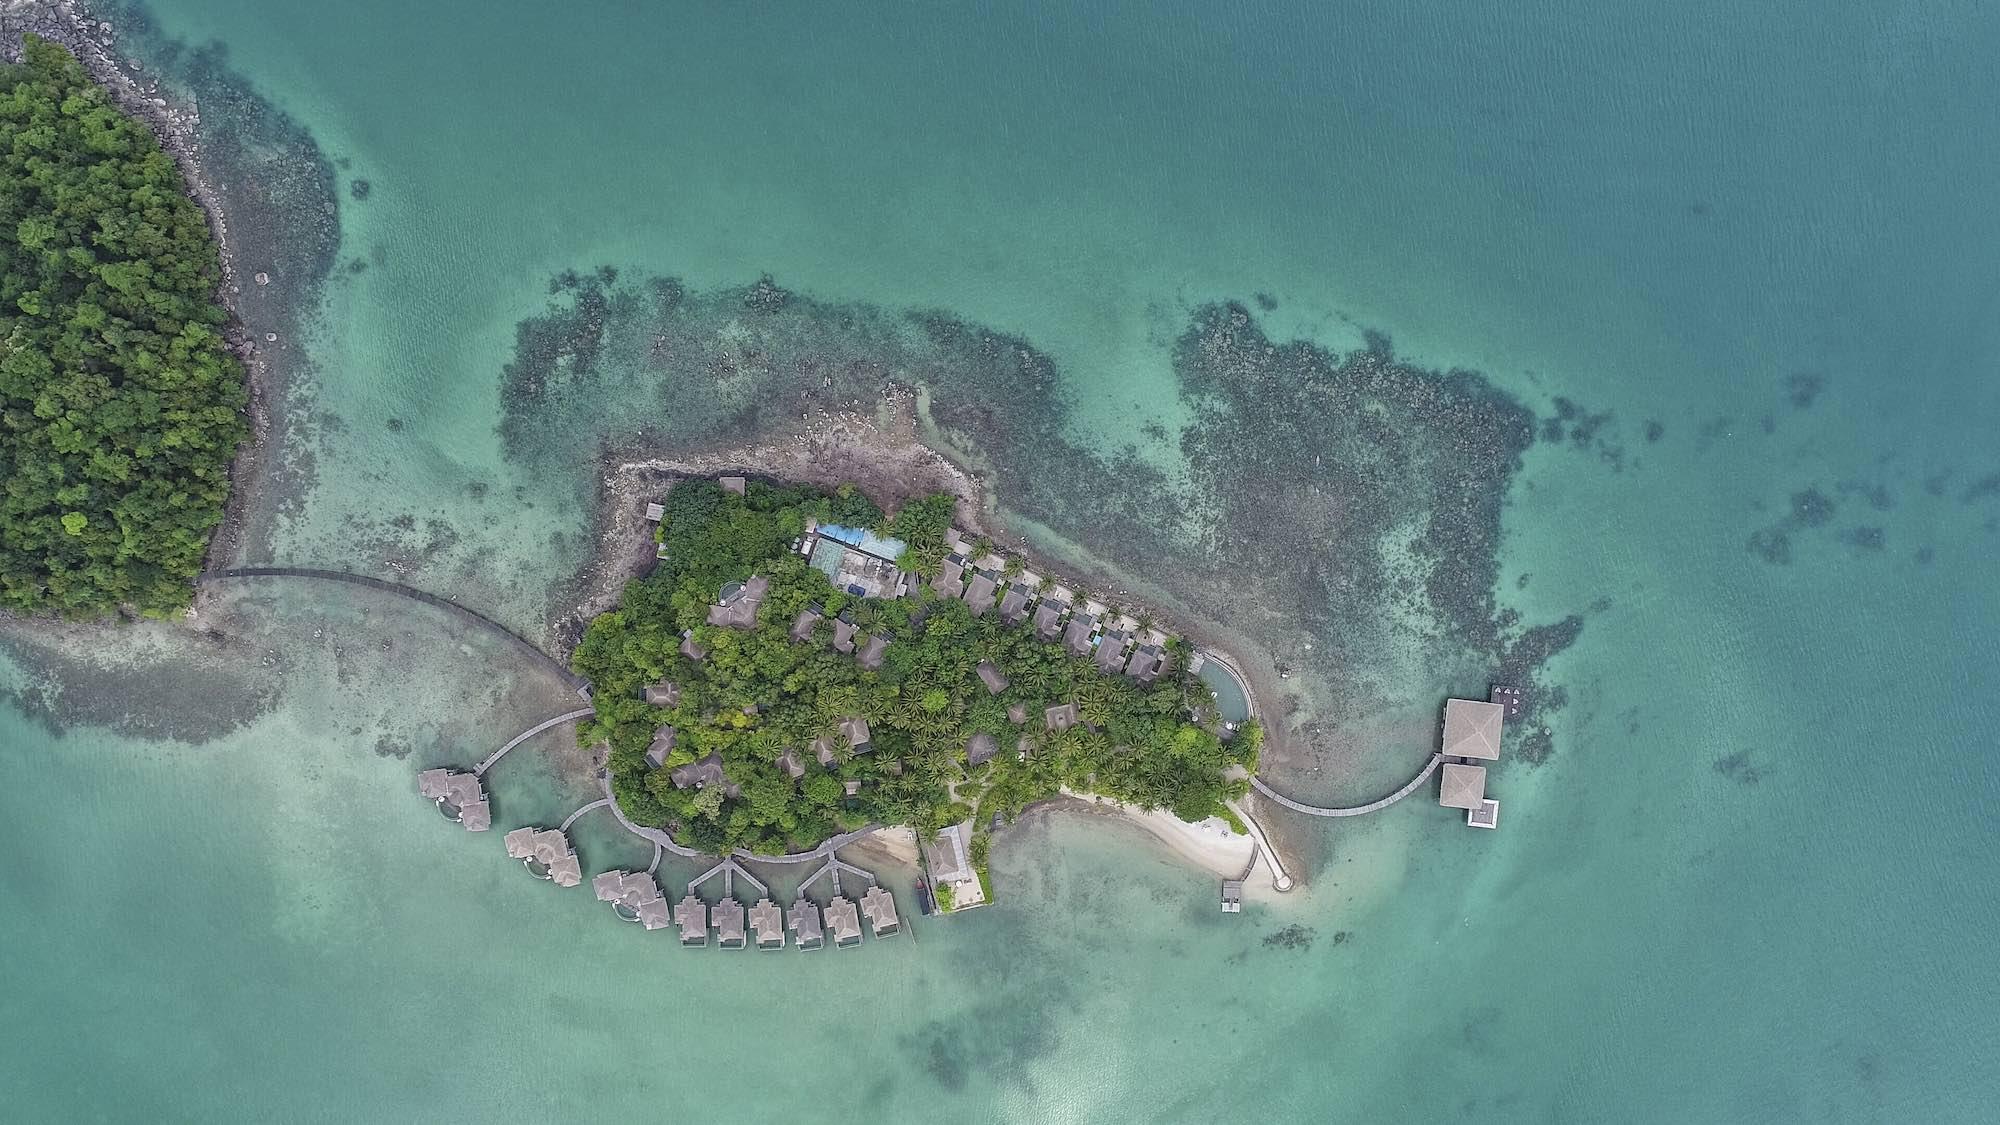 Hospitality hotel resort luxurious luxury photography services singapore asia photographer travel island cambodia drone